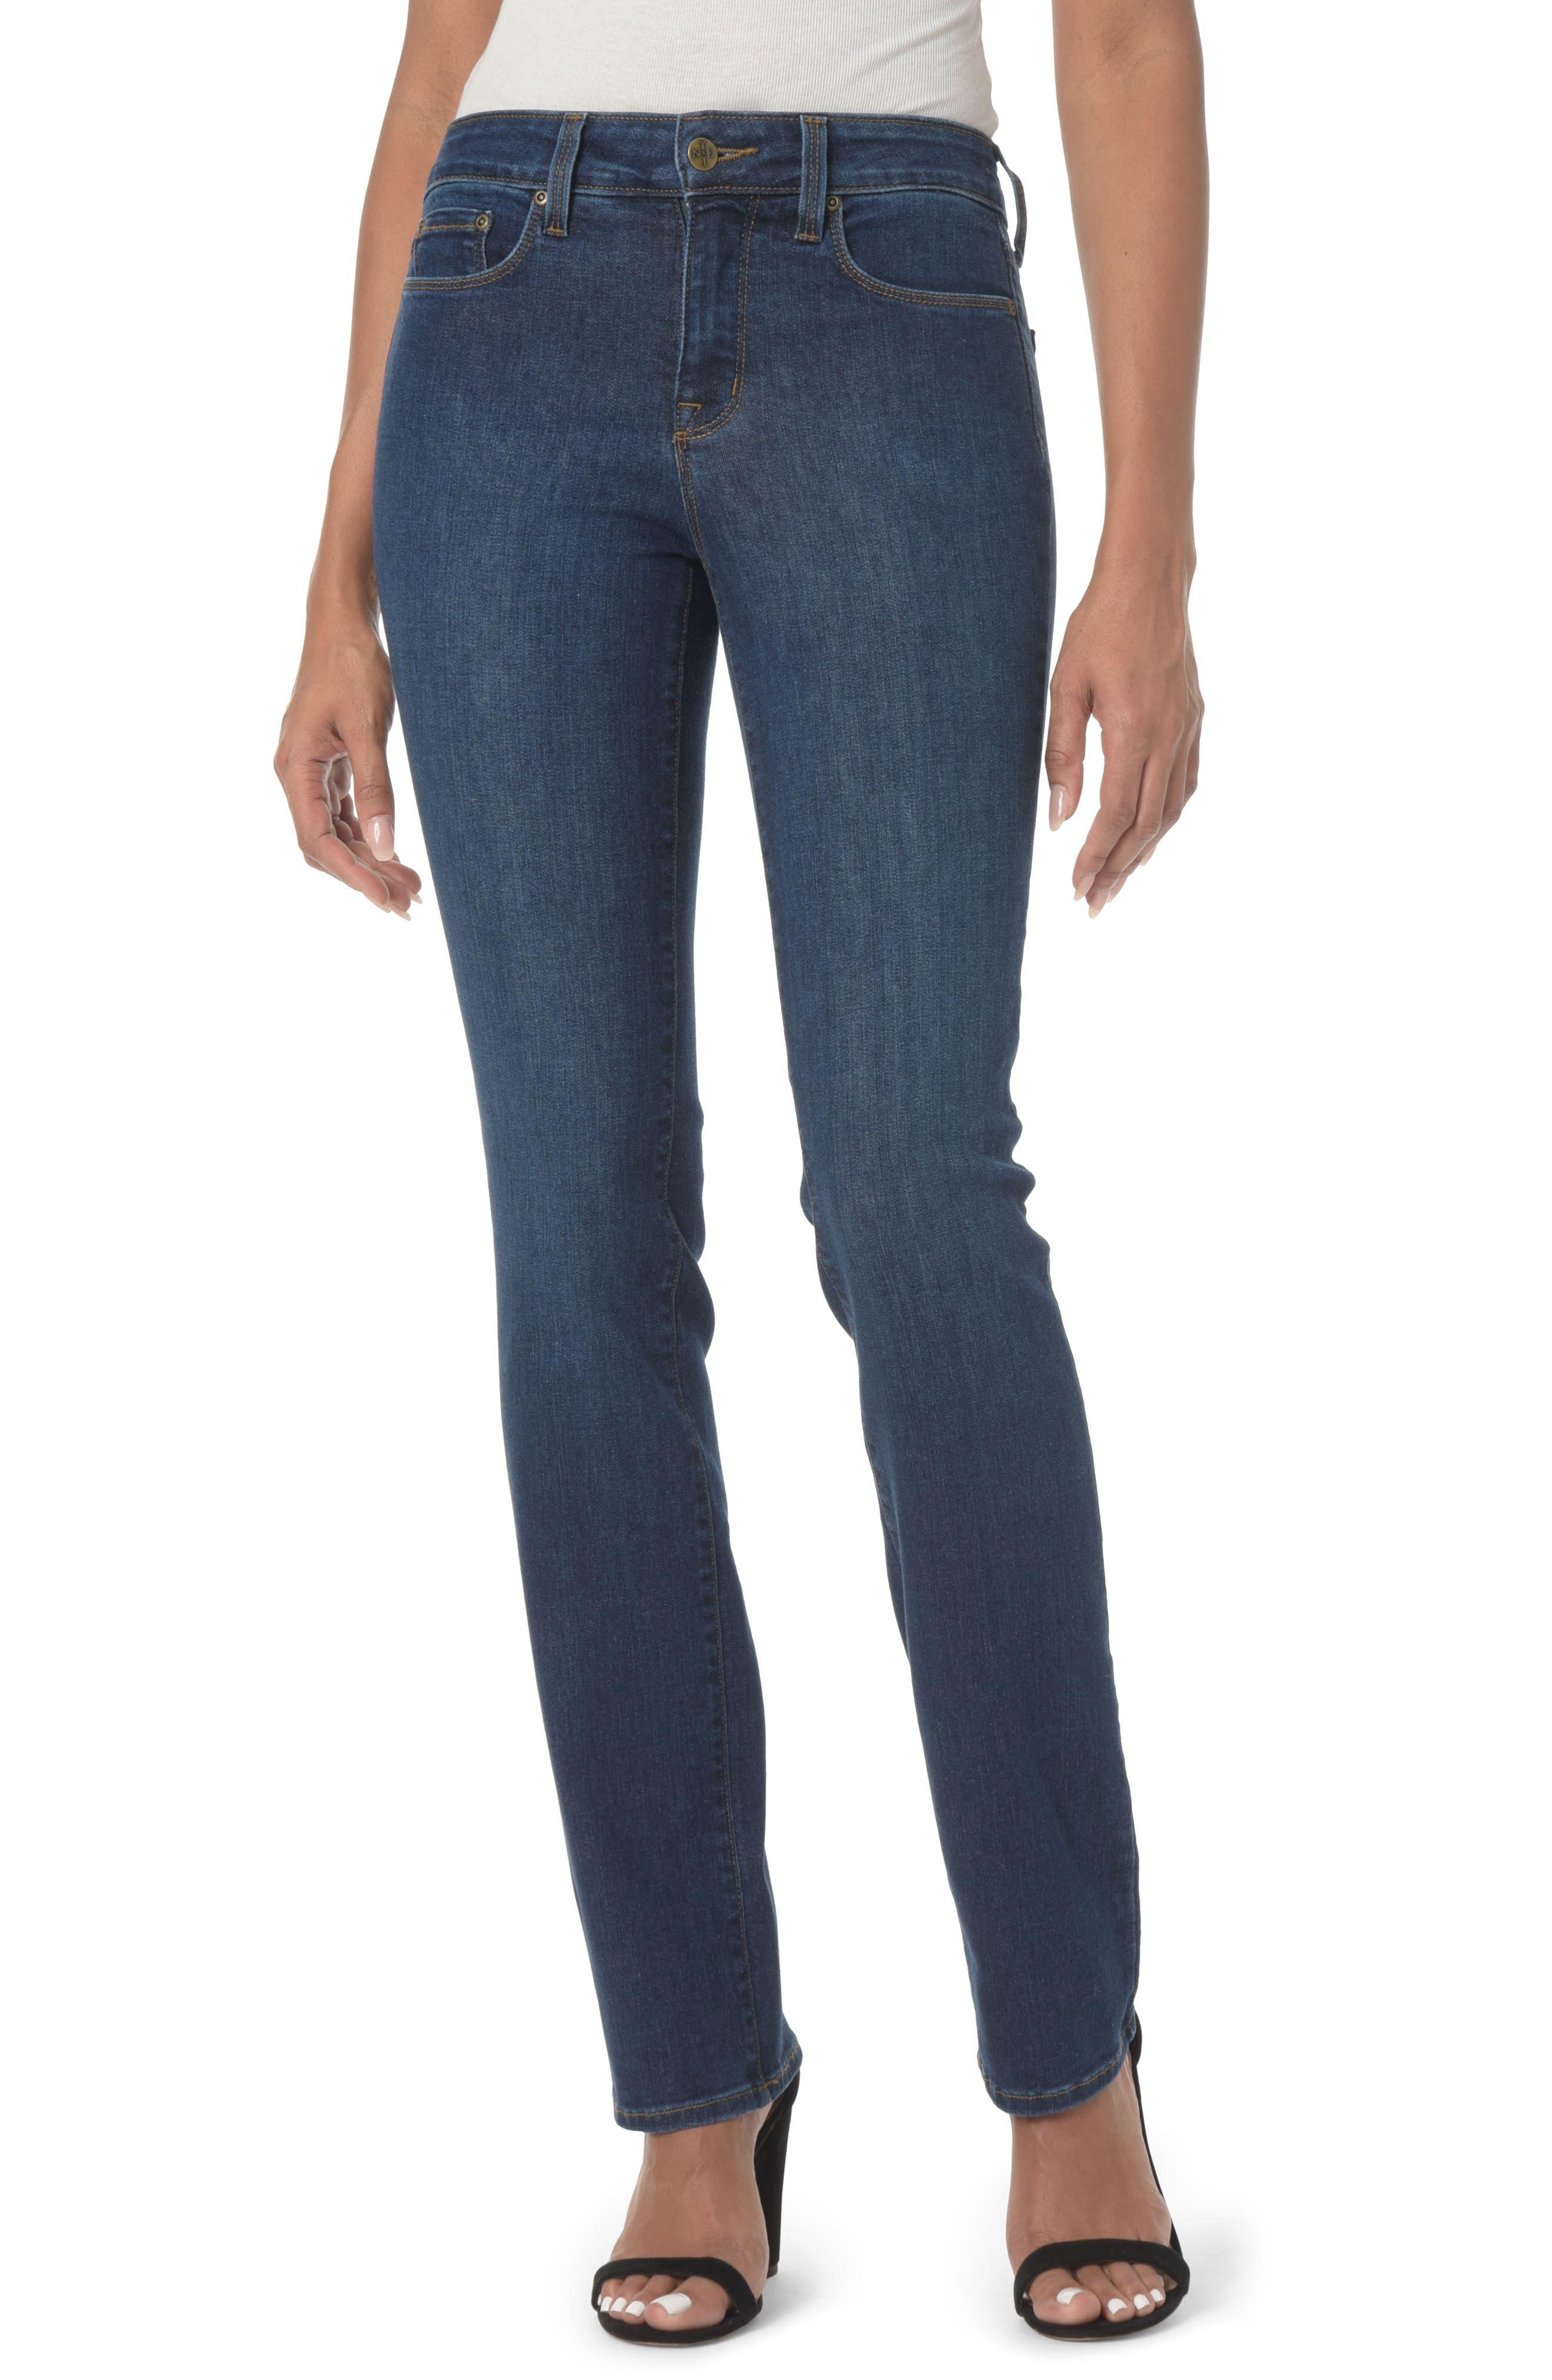 NYDJ Marilyn High Waist Stretch Straight Leg Jeans (Regular & Petite)